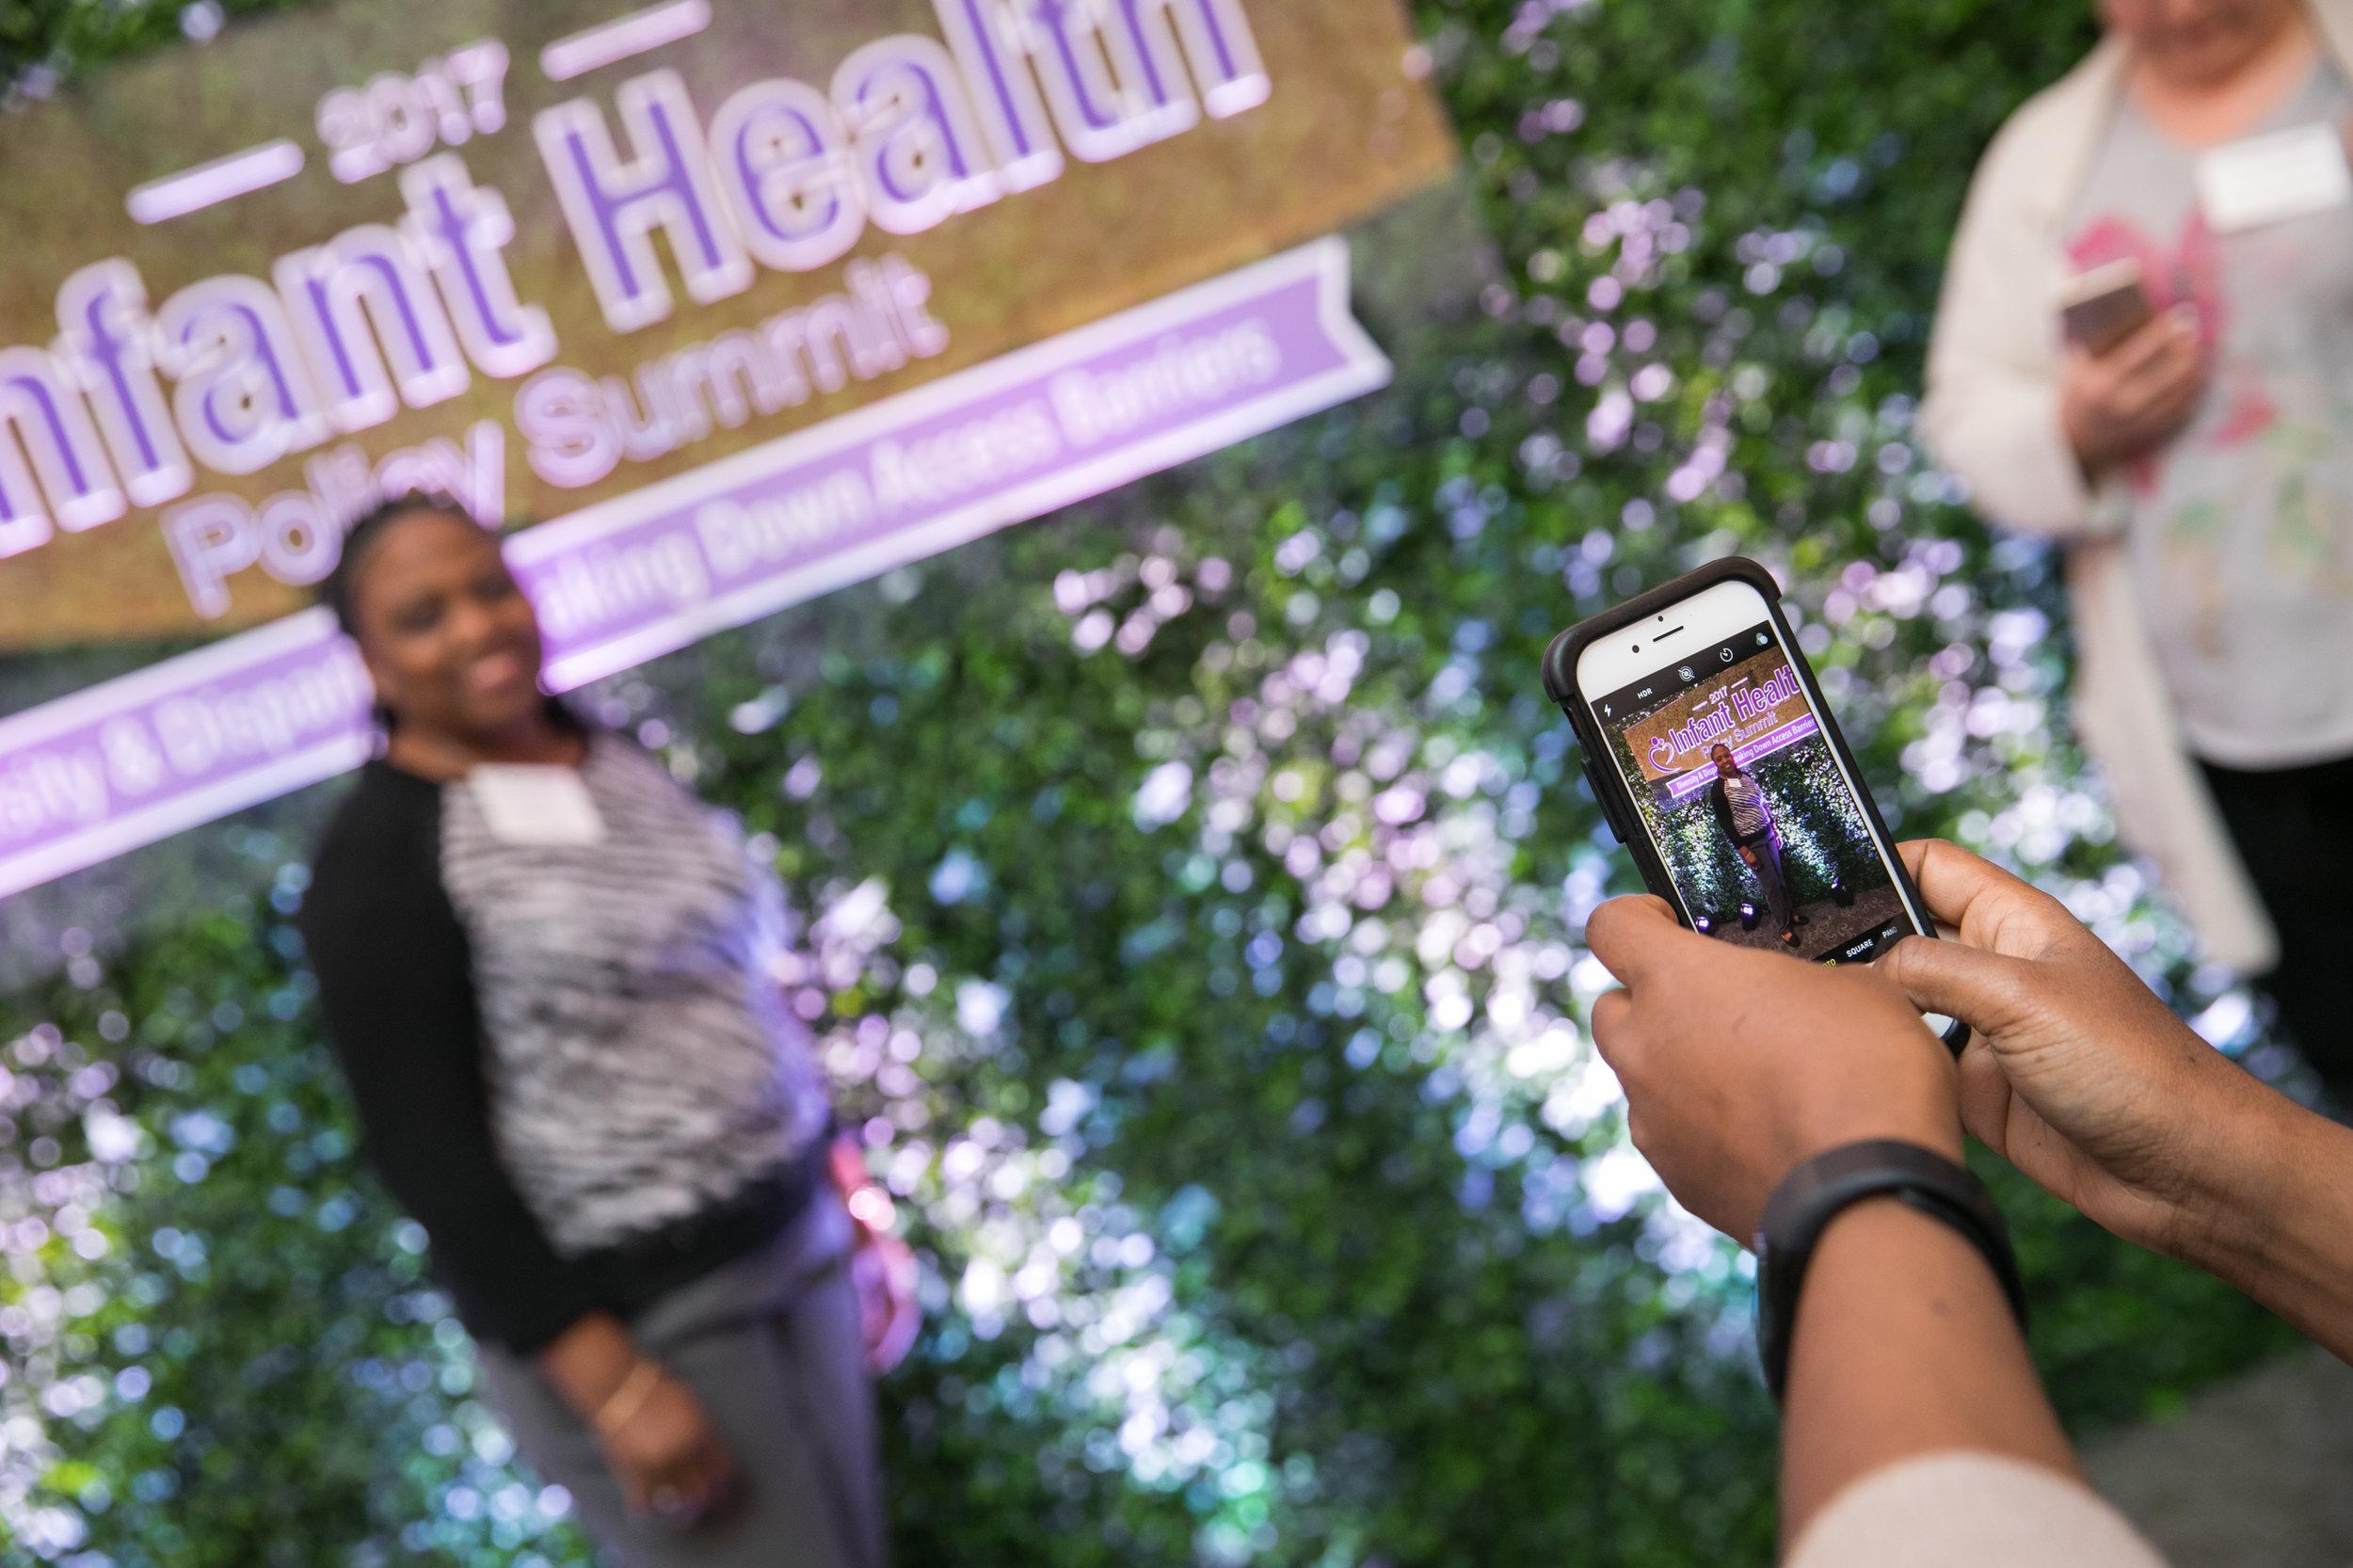 Infant Health Policy Summit - Jason Dixson Photography - 101924 - 0343.jpg